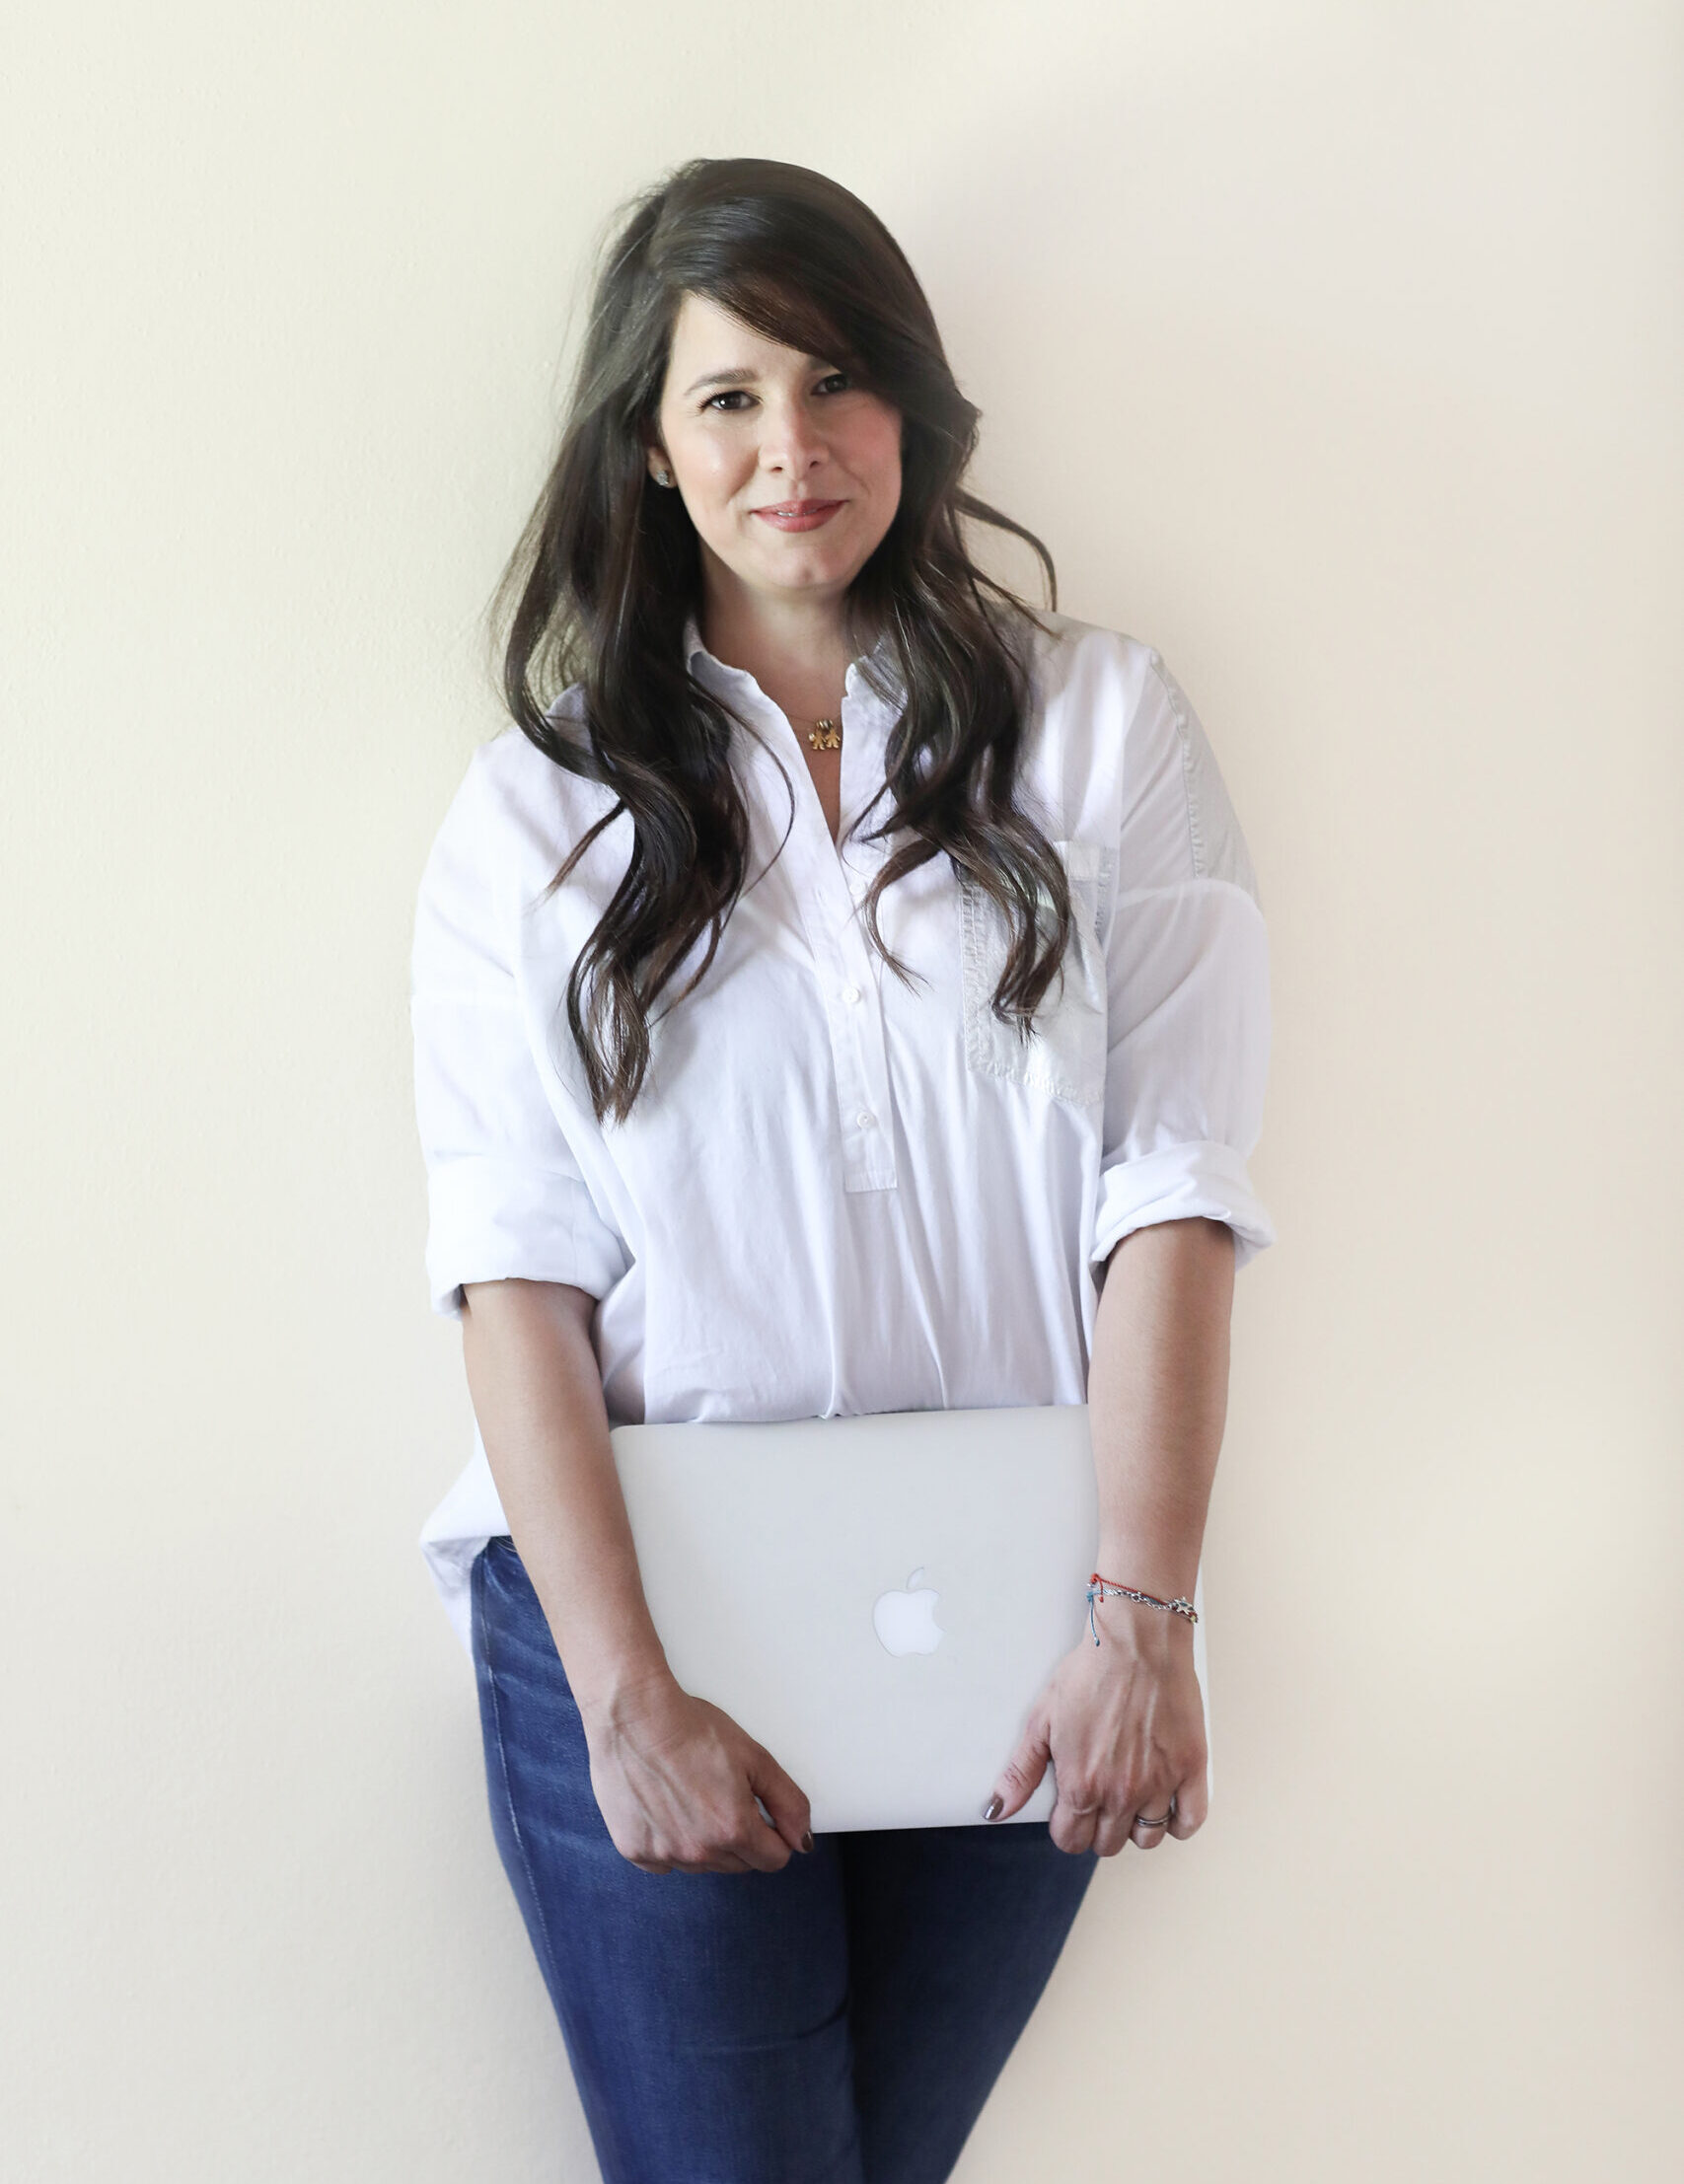 Maria Alejandra Ramirez computadora mac book